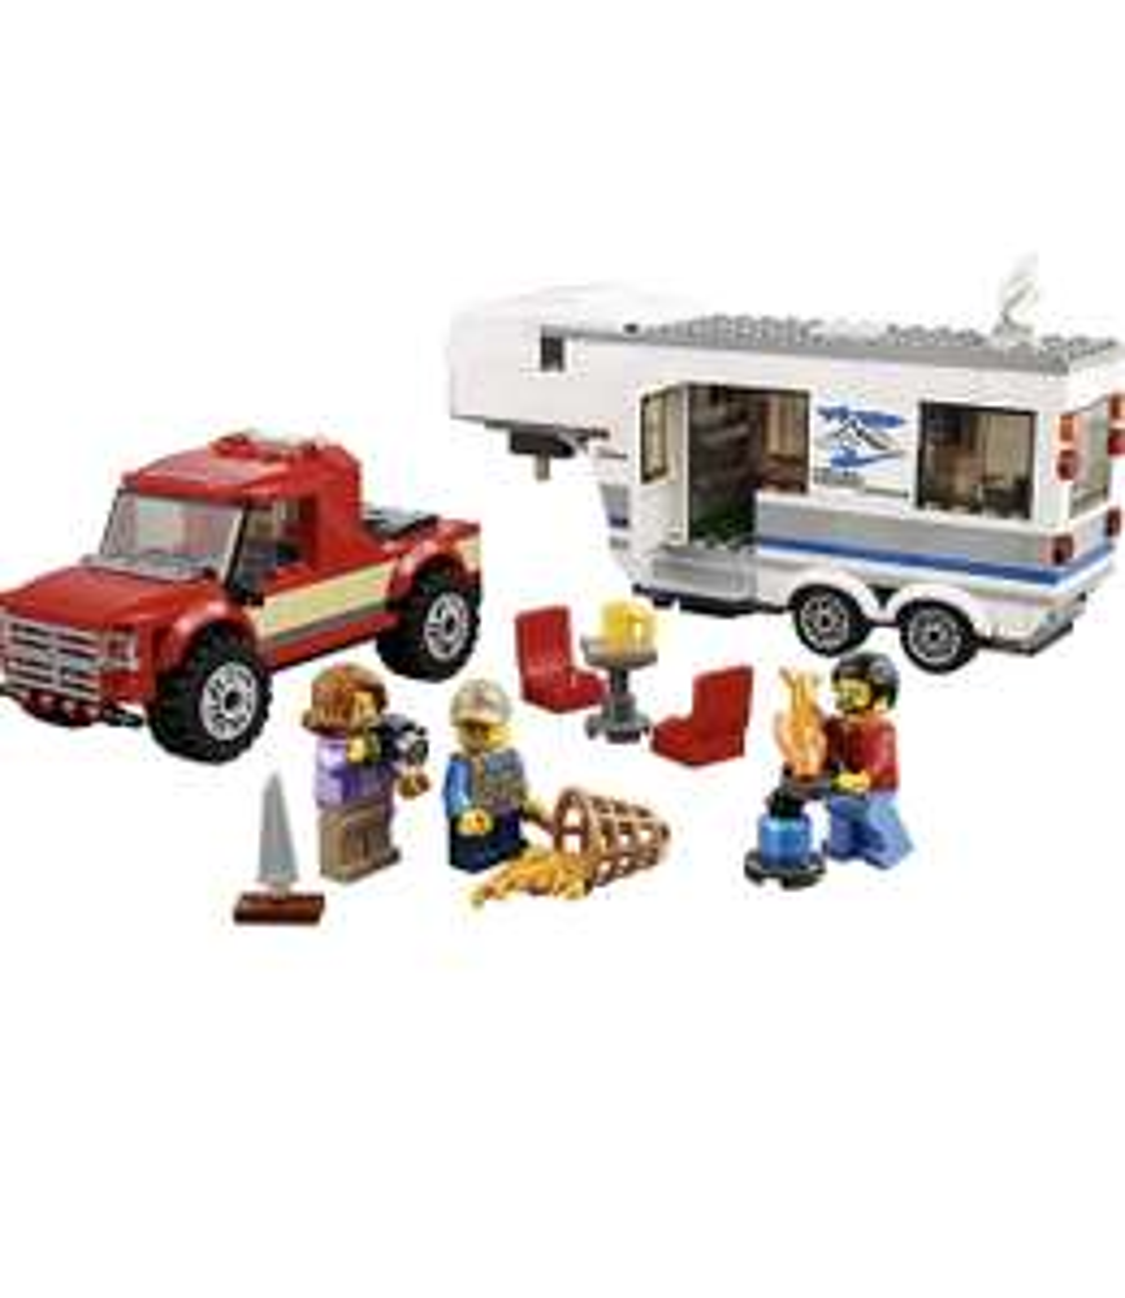 LEGO 60182 City Great Vehicles Pickup & Caravan Playset - £13.99 (Prime) £18.48 (Non Prime) @ Amazon